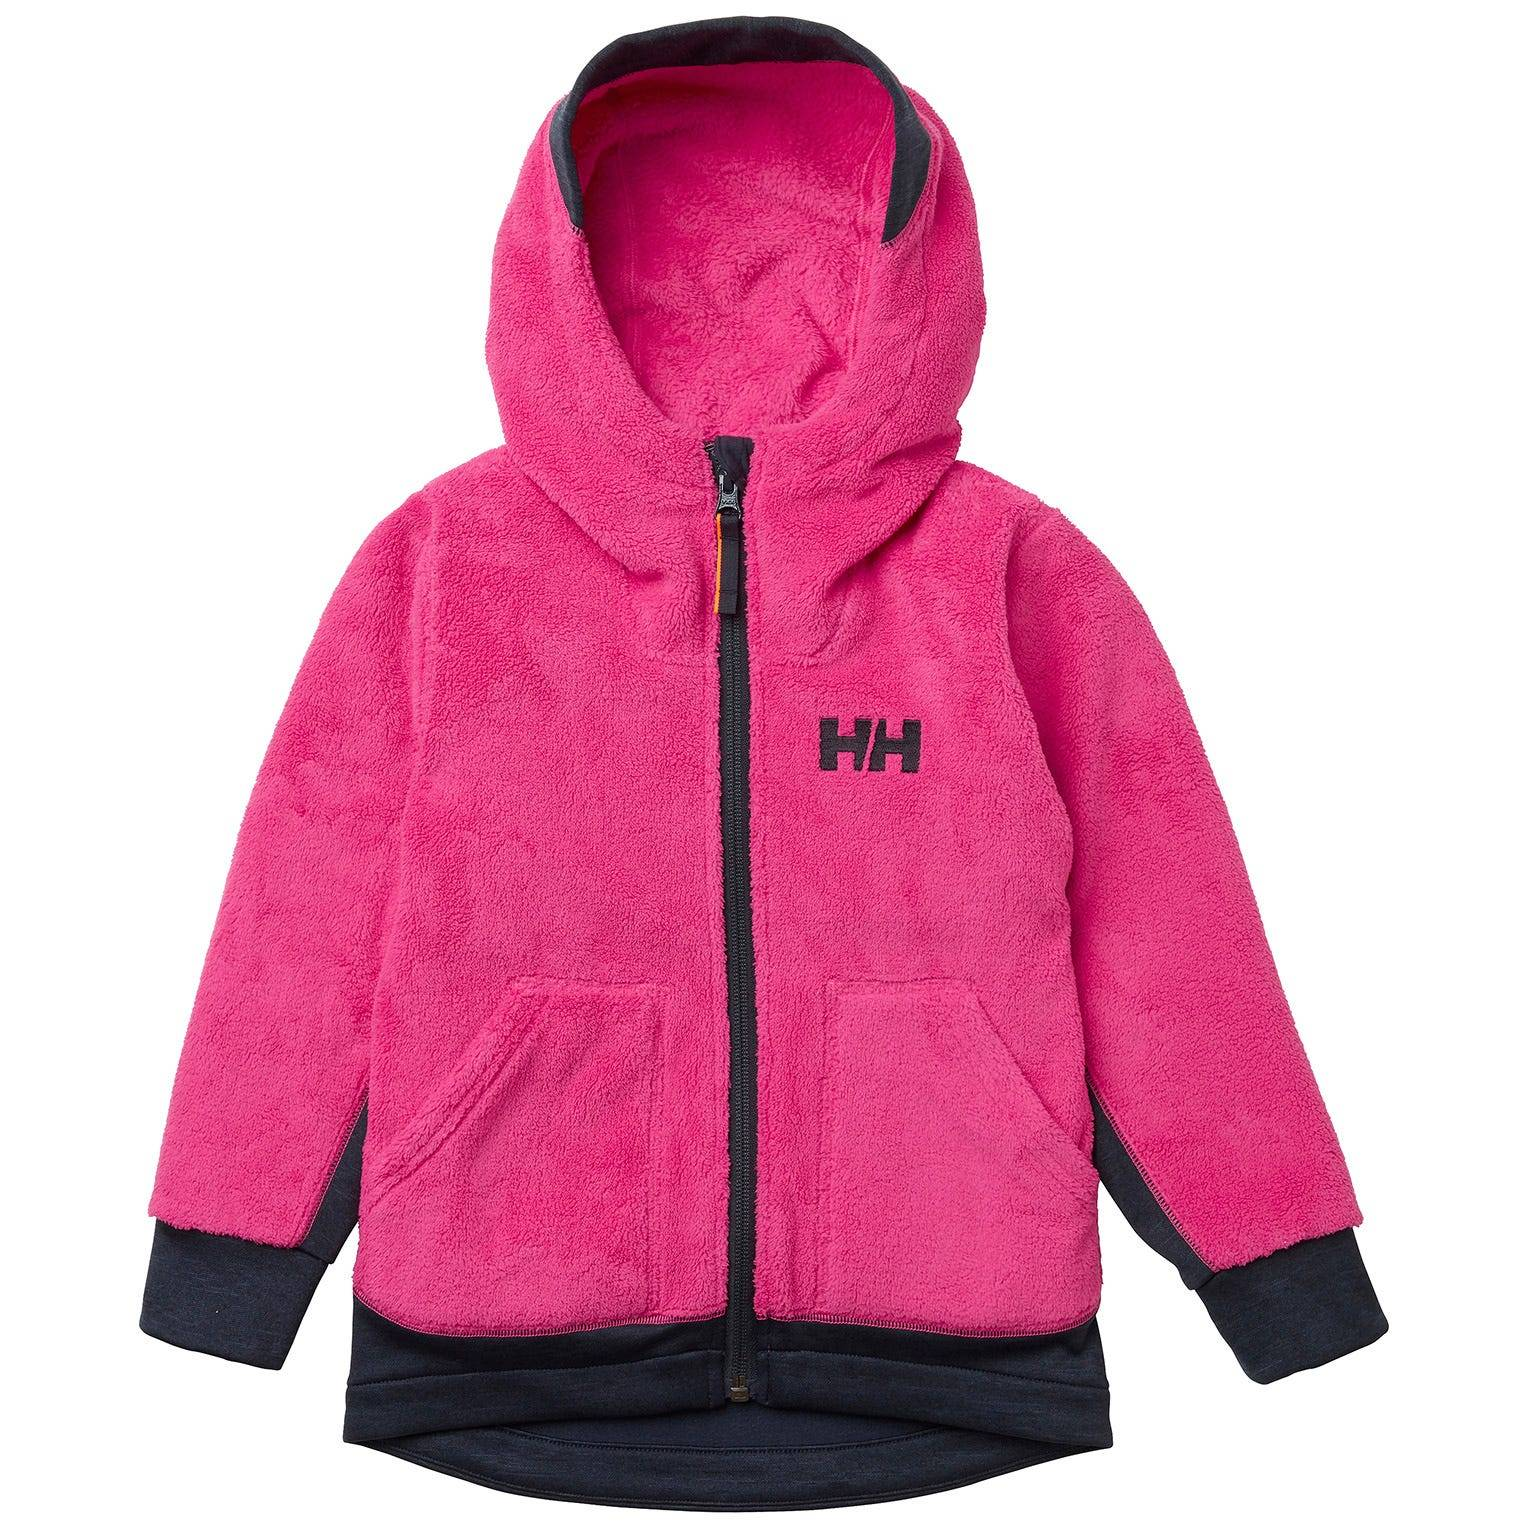 Helly Hansen Kids Chill Fz Hoodie Fleece Pink 86/1